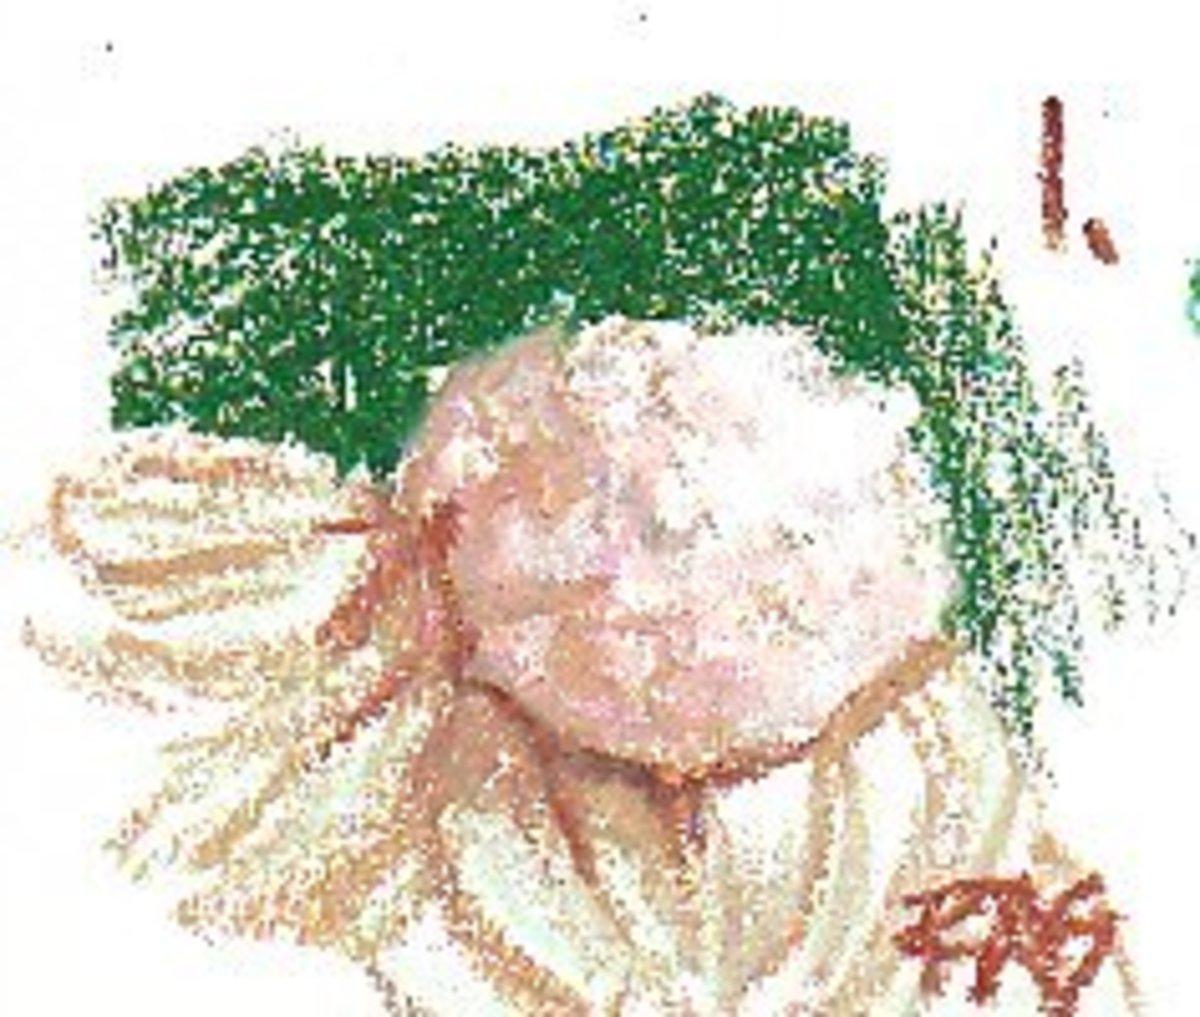 Cauliflower Study, oil pastel on sketchbook by Robert A. Sloan